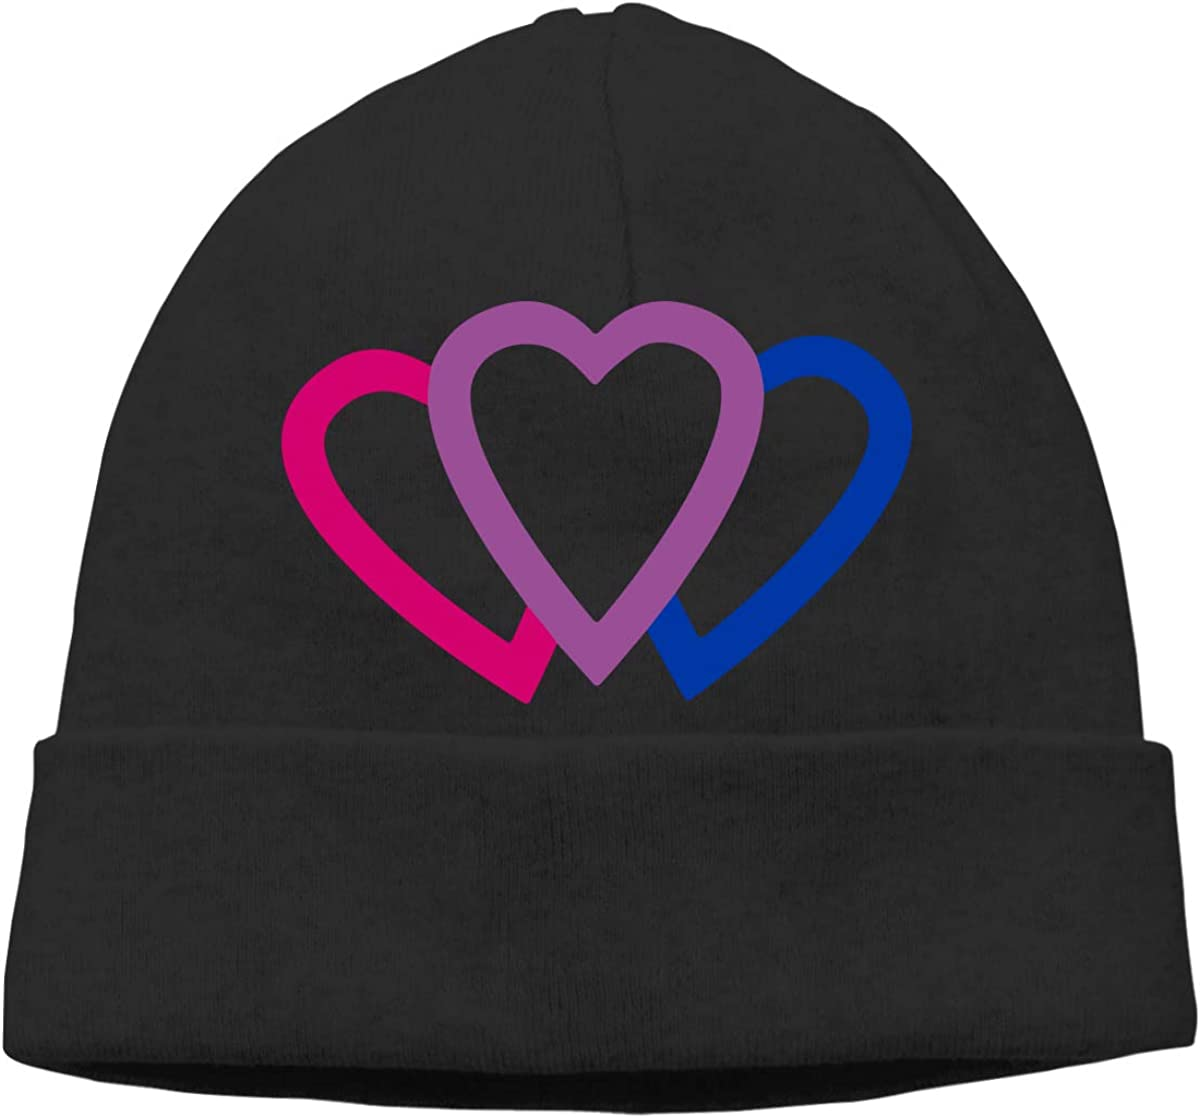 A17BTM Boys and Girls Skullies Beanies Bisexual Pride Retro Toboggan Hat Sports /& Outdoors Knit Hat Black